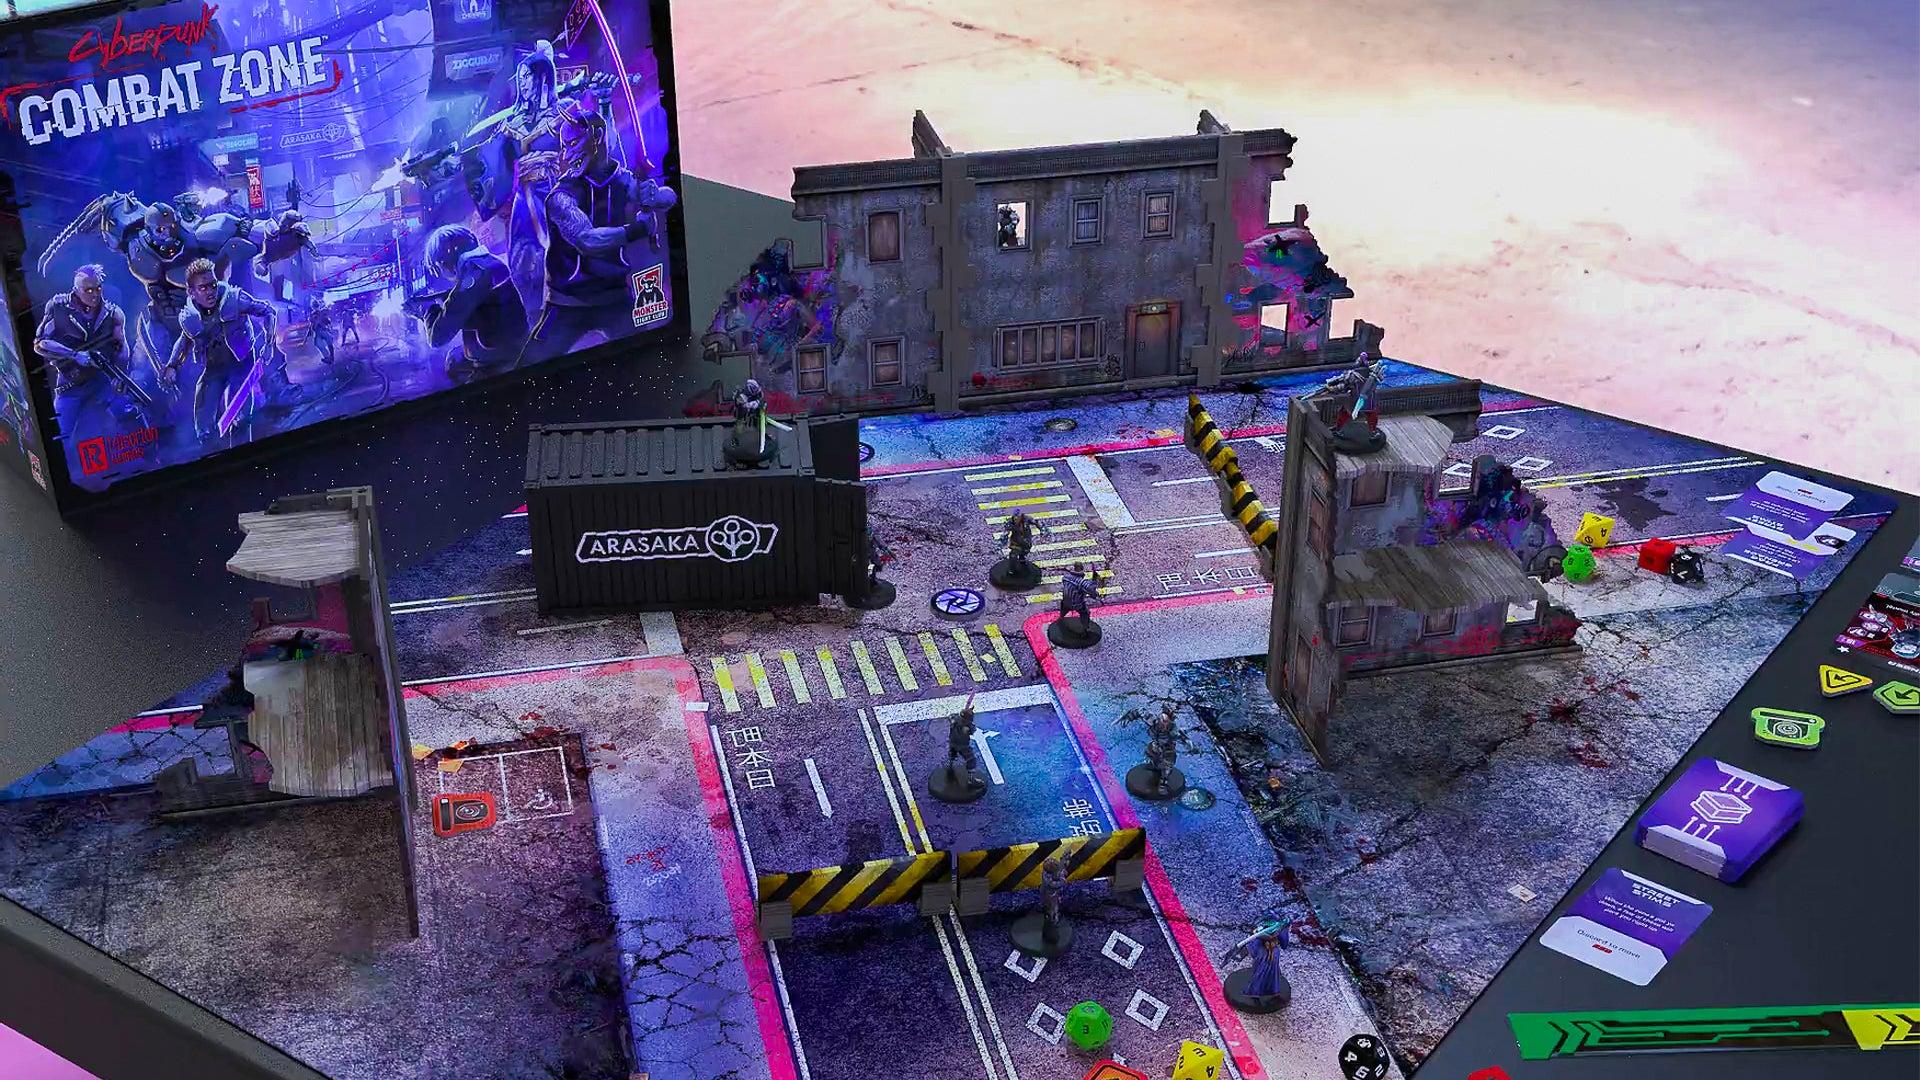 cyberpunk-red-combat-zone-gameplay-layout-box.jpg